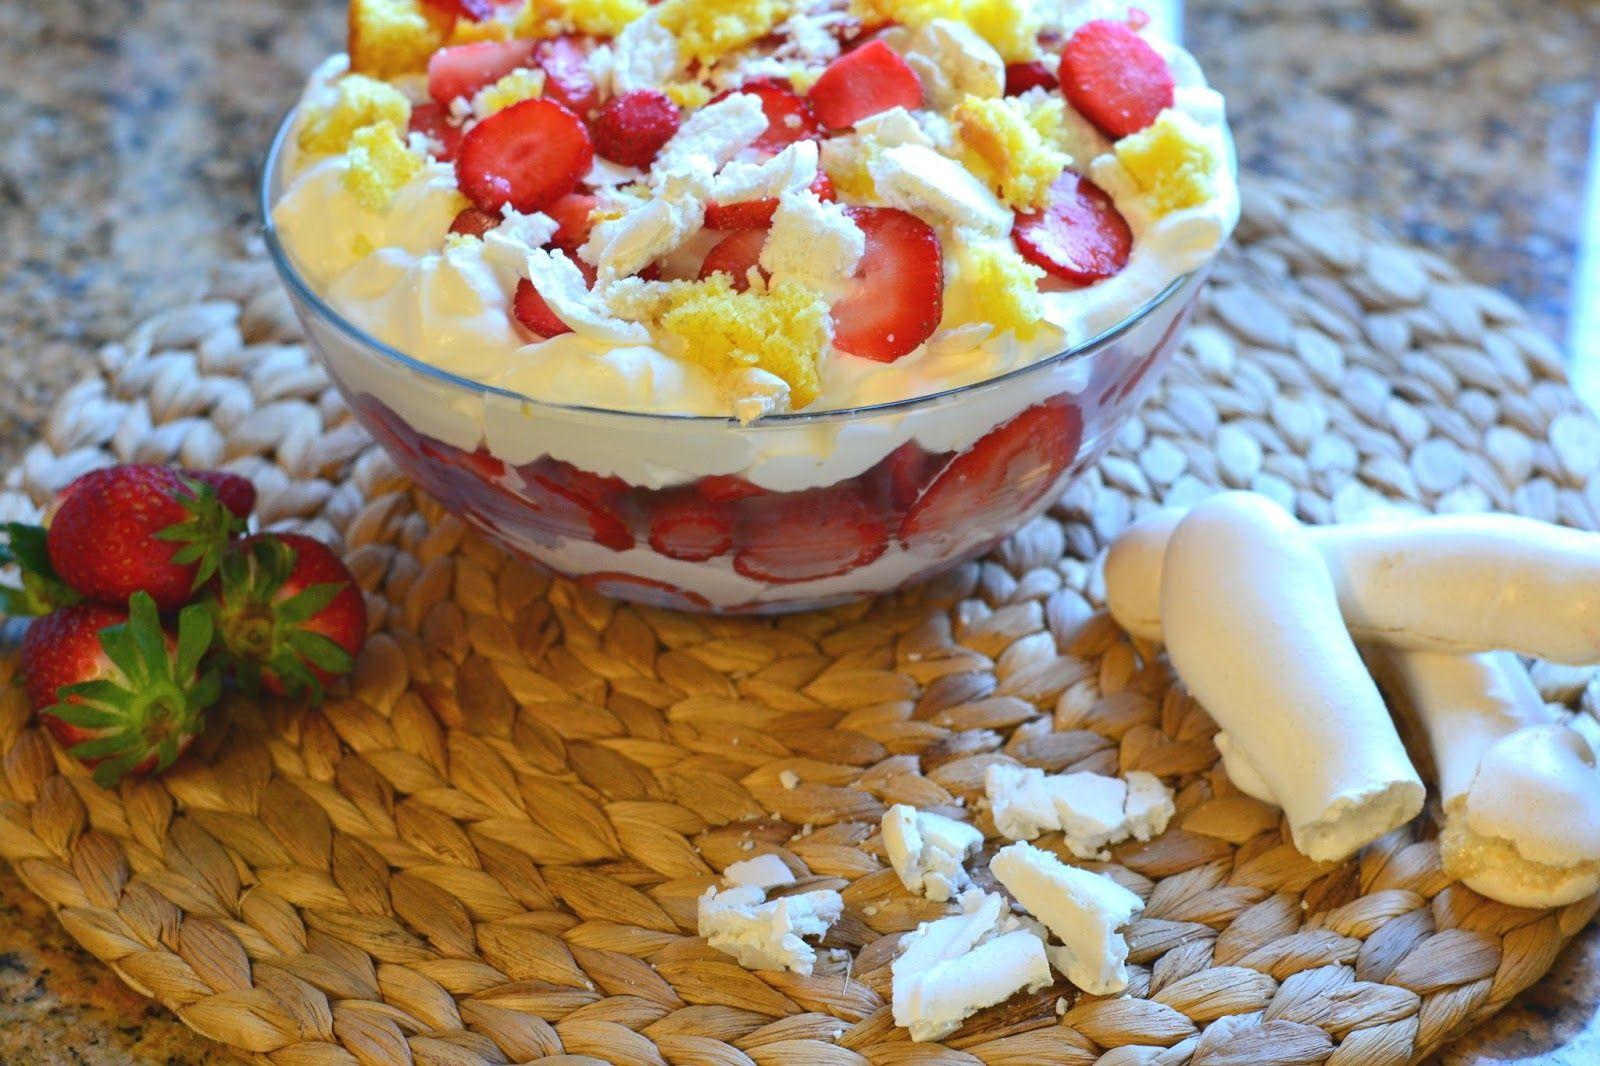 Petiscana: Trifle fingido [Fake Trifle]